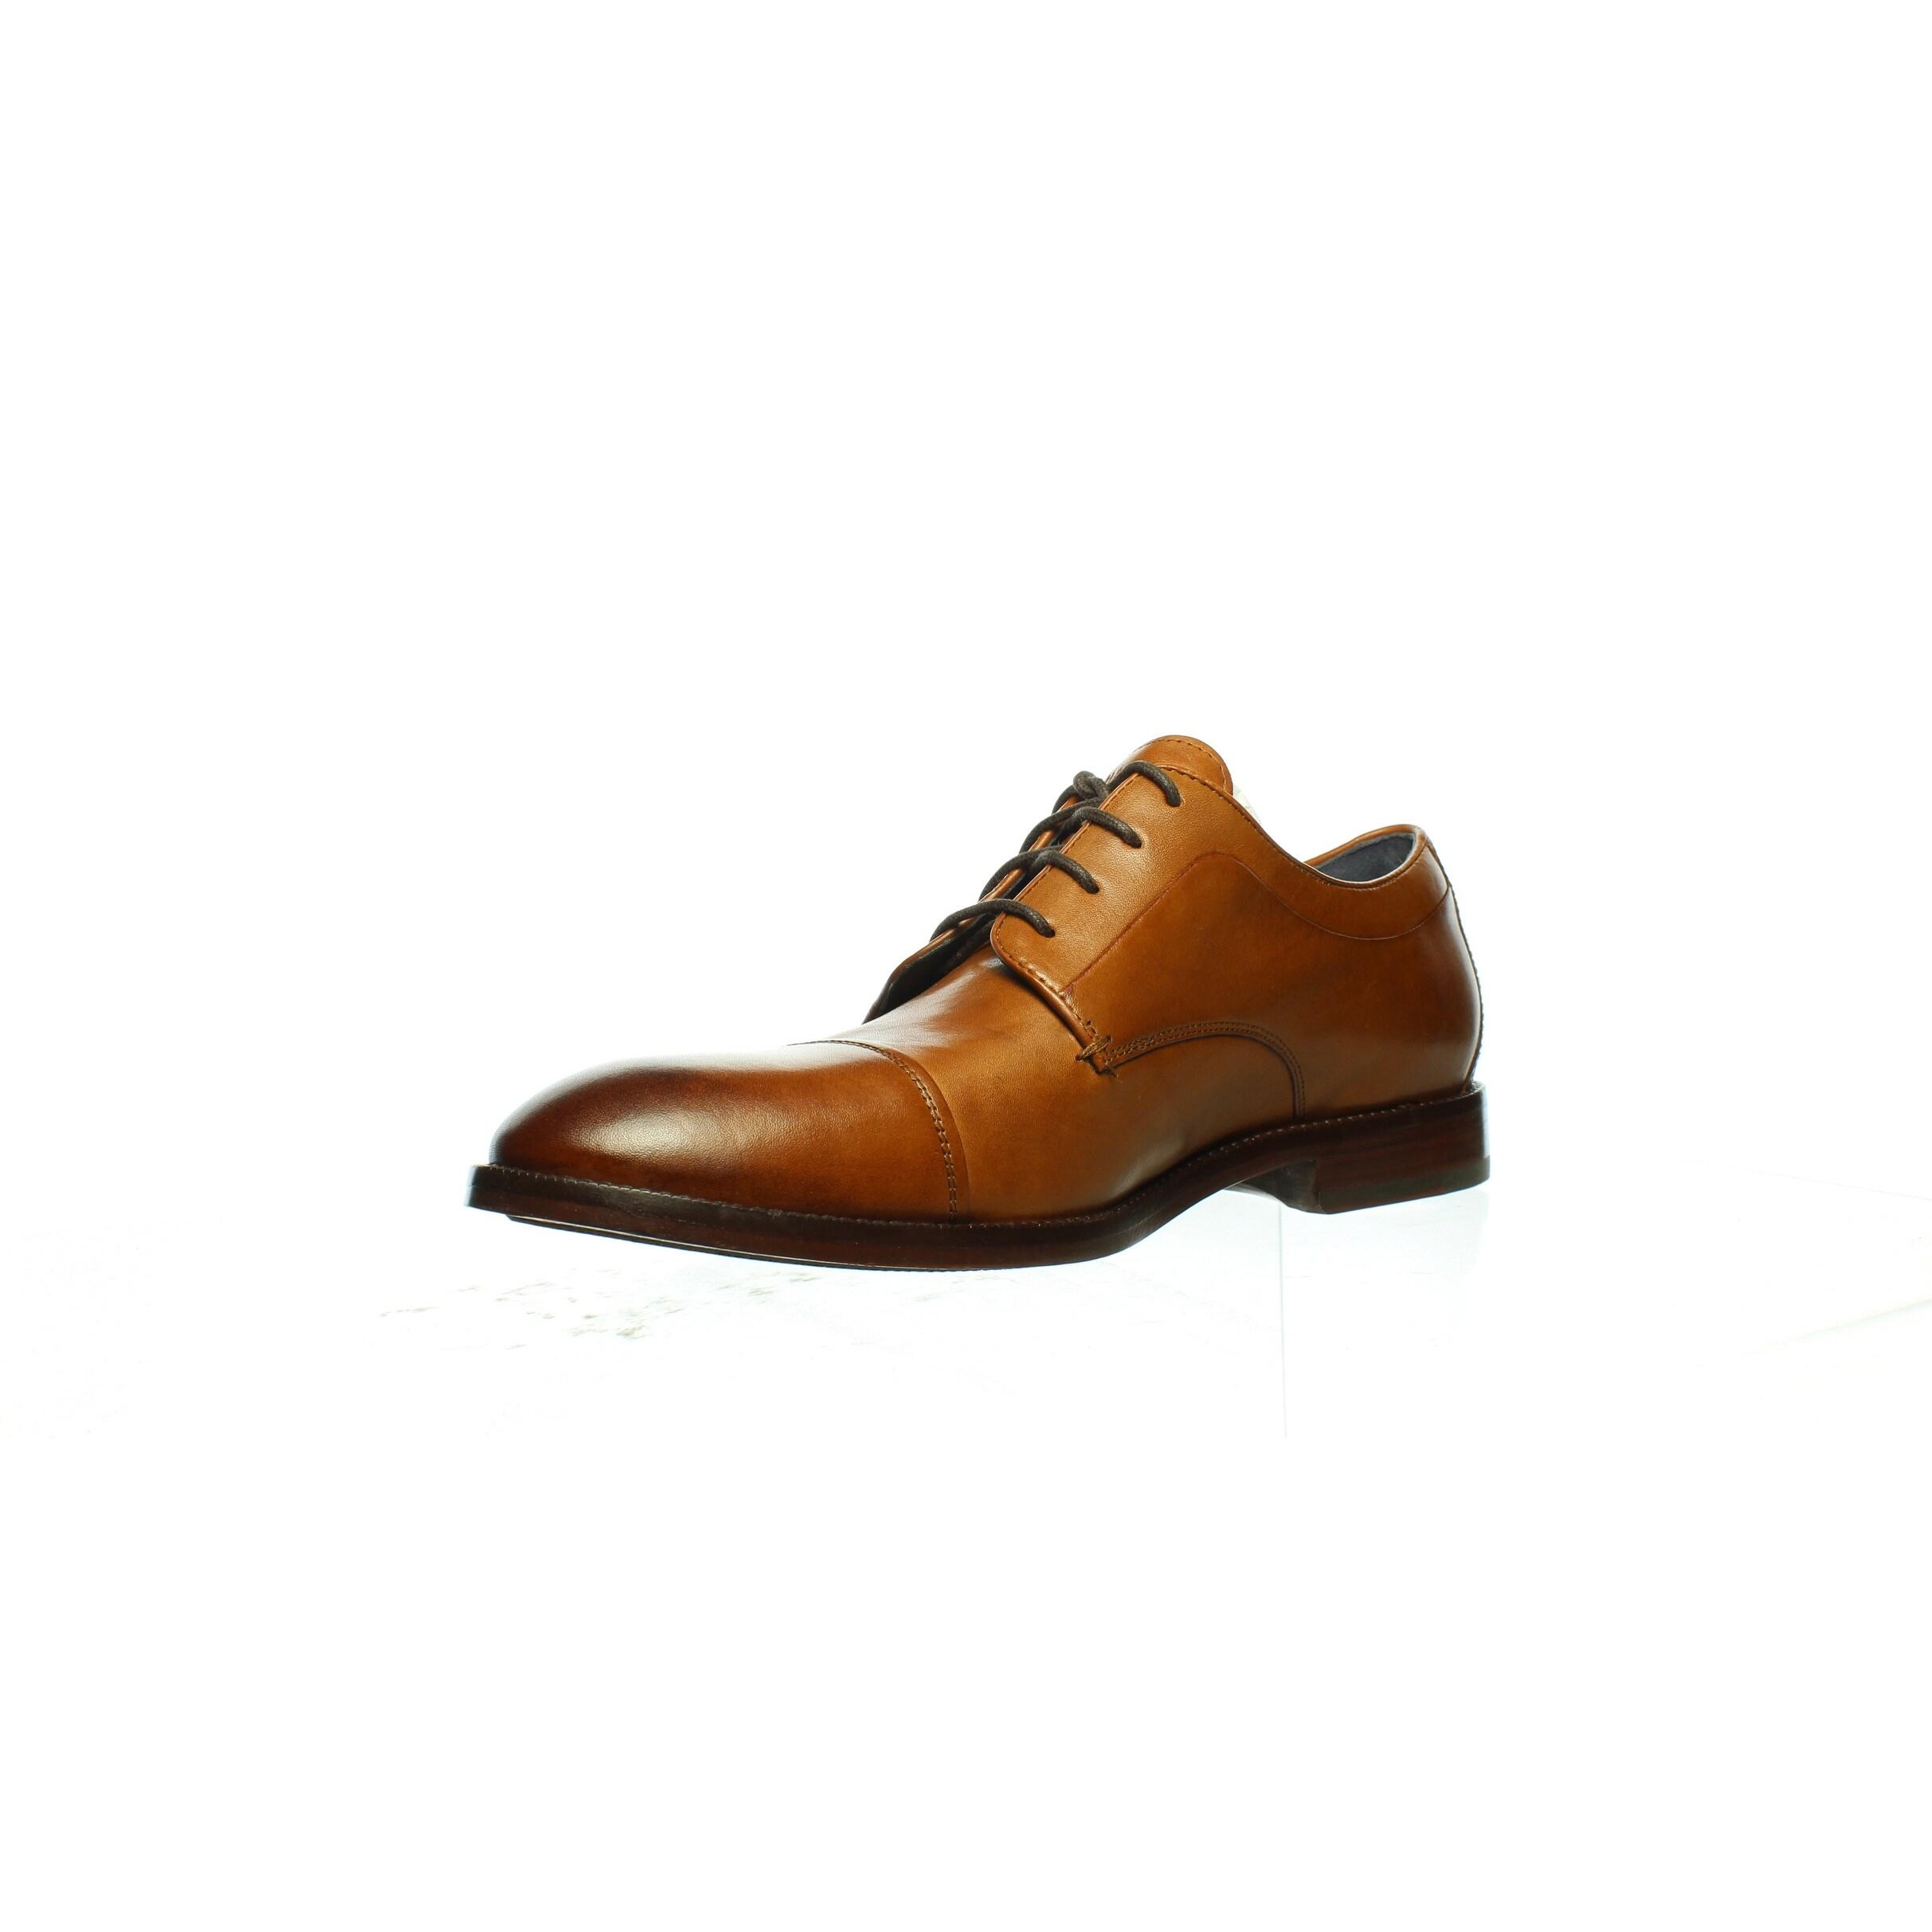 E BHFO 8121 Cole Haan Mens Harrison Grand 2.0 Brown Dress Oxfords Shoes 9 Wide